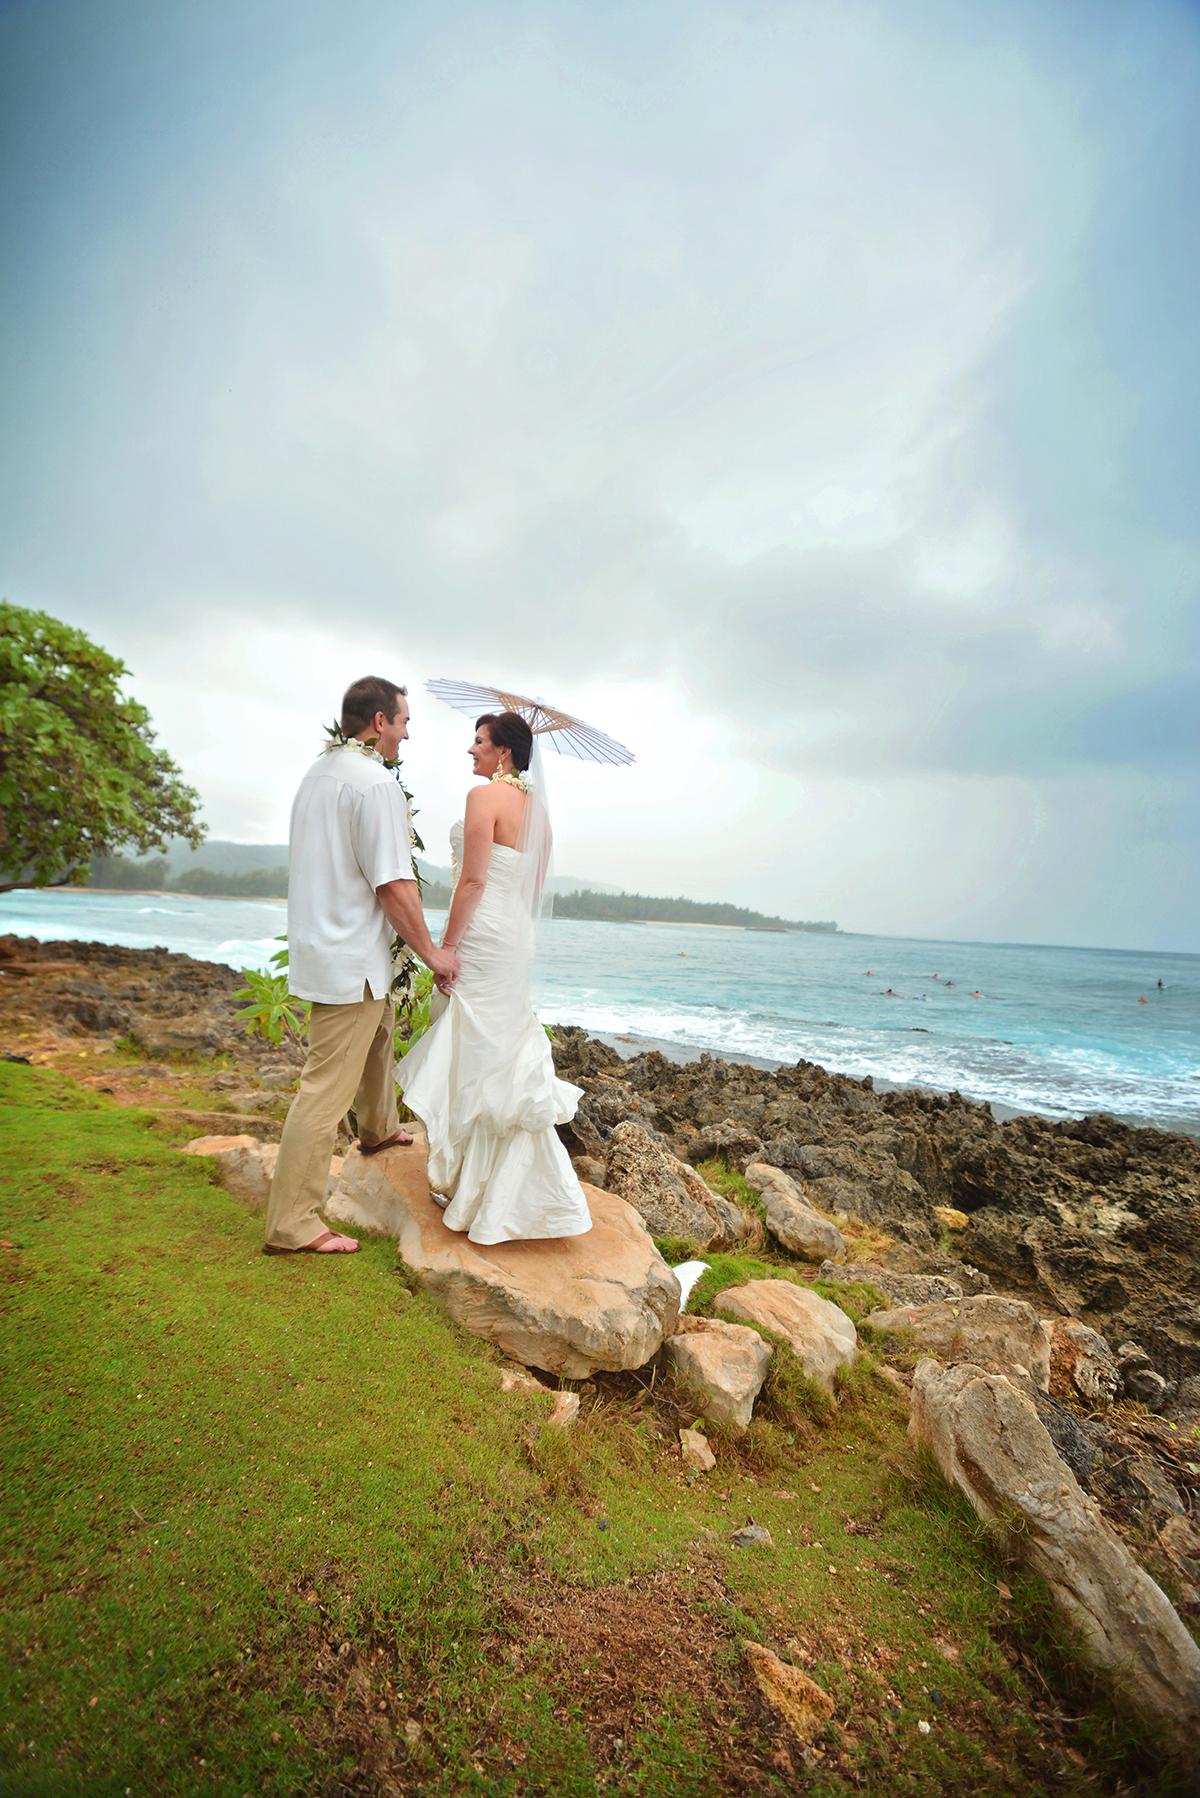 Michelle Garibay Events | Turtle Bay Resort Wedding | Hawaii Destination Wedding Planner | North Shore Oahu Wedding